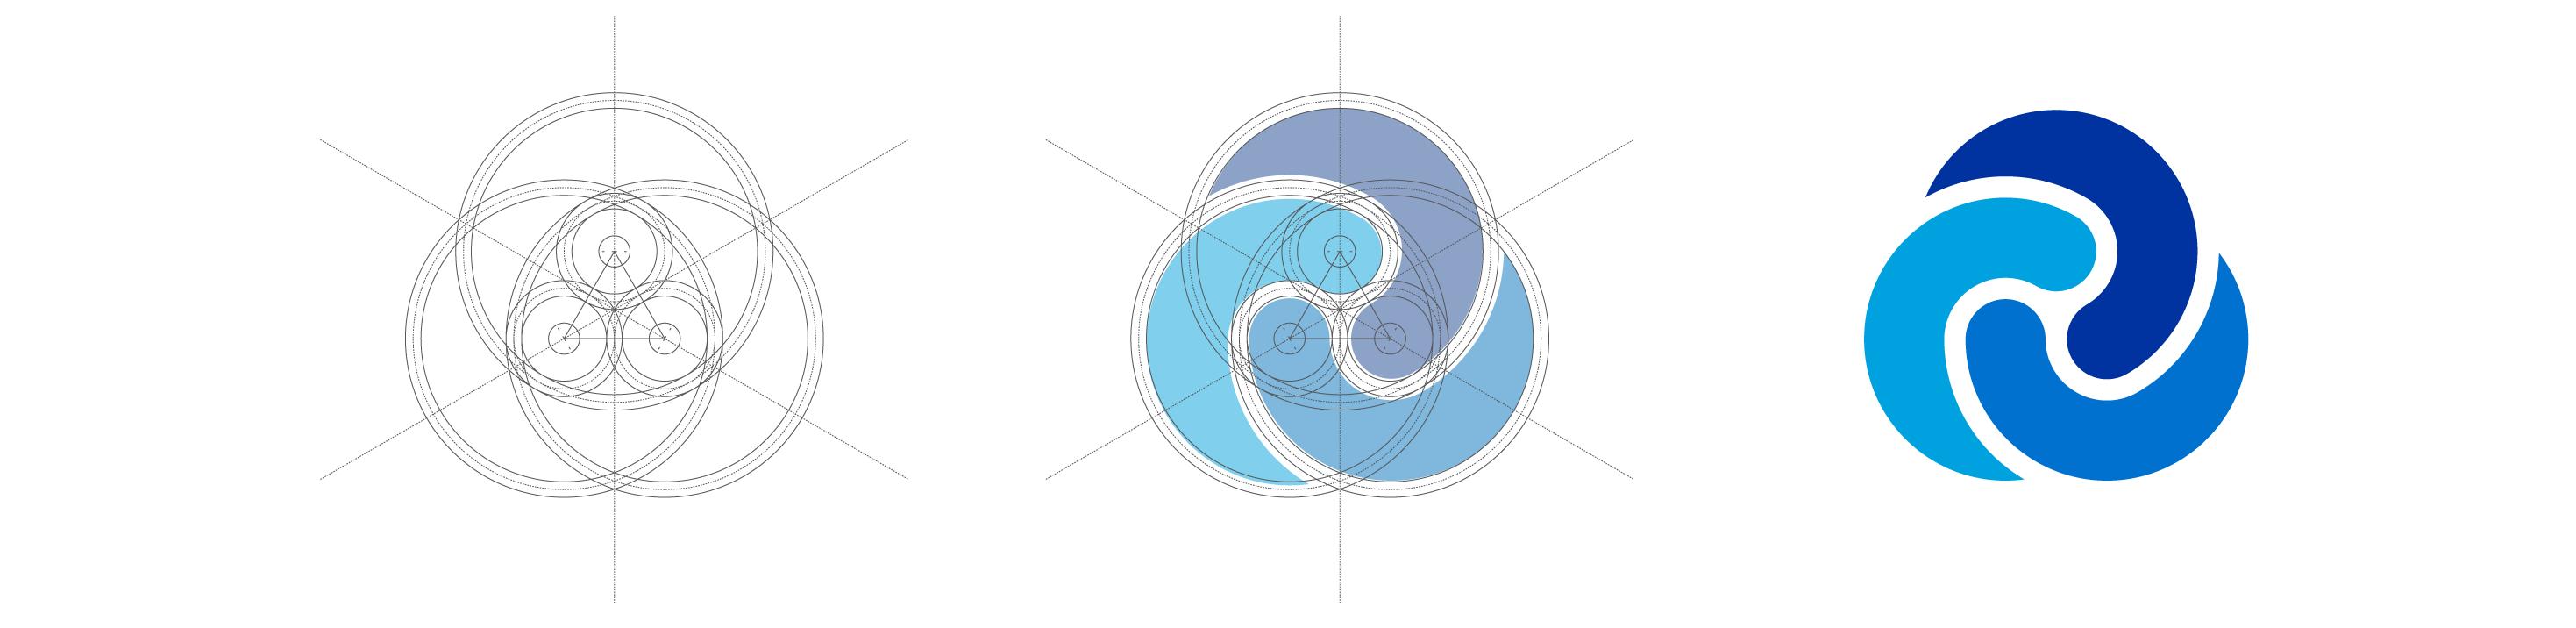 Logo Identity and Design